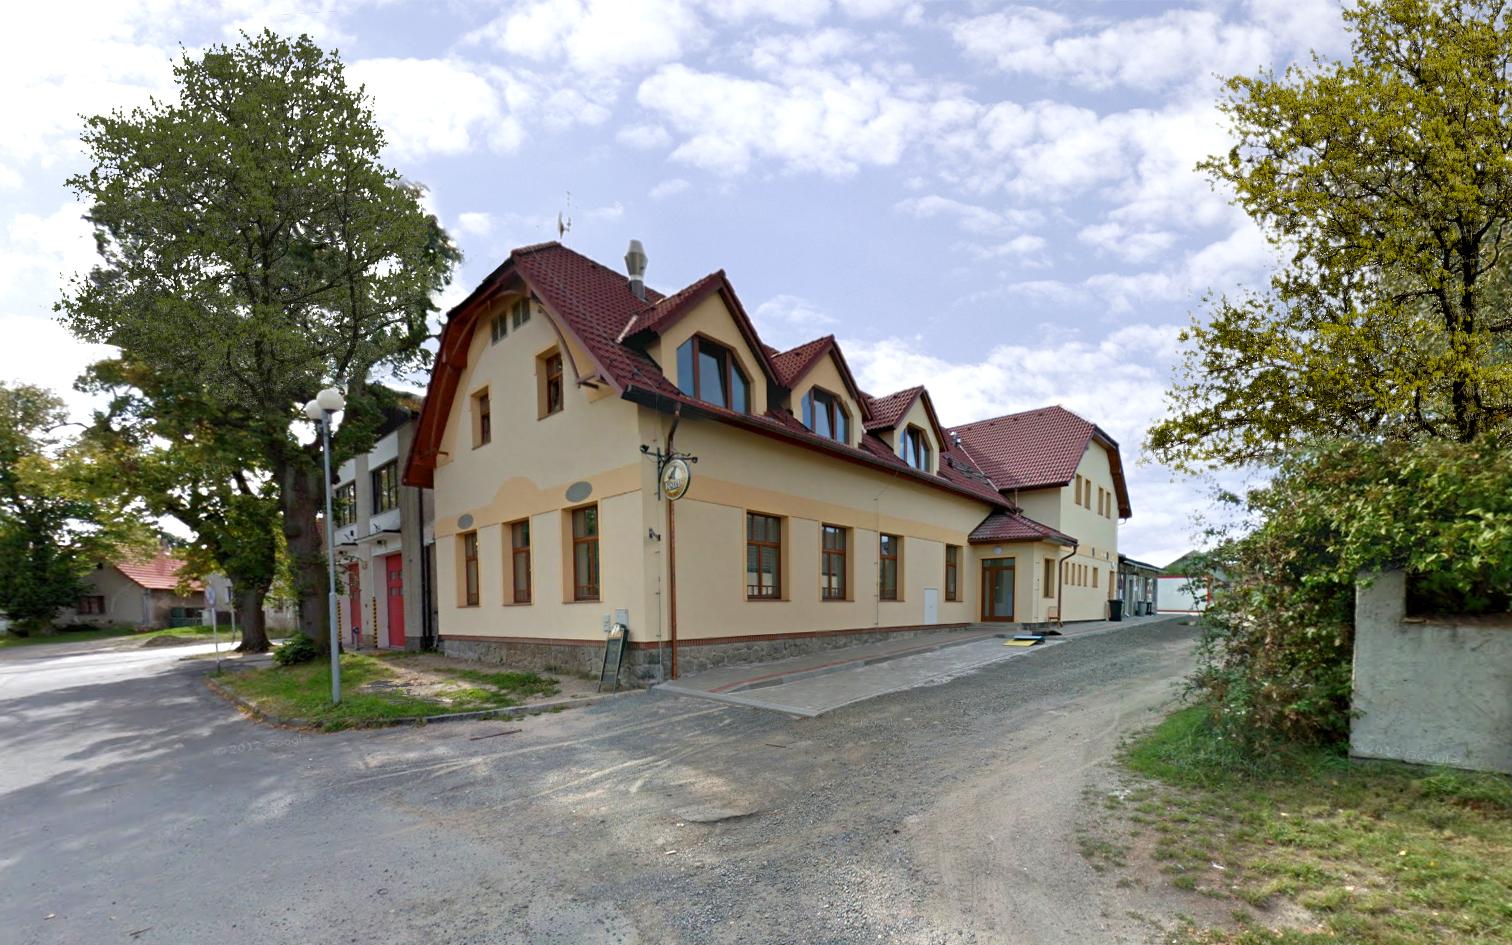 tehovec_03